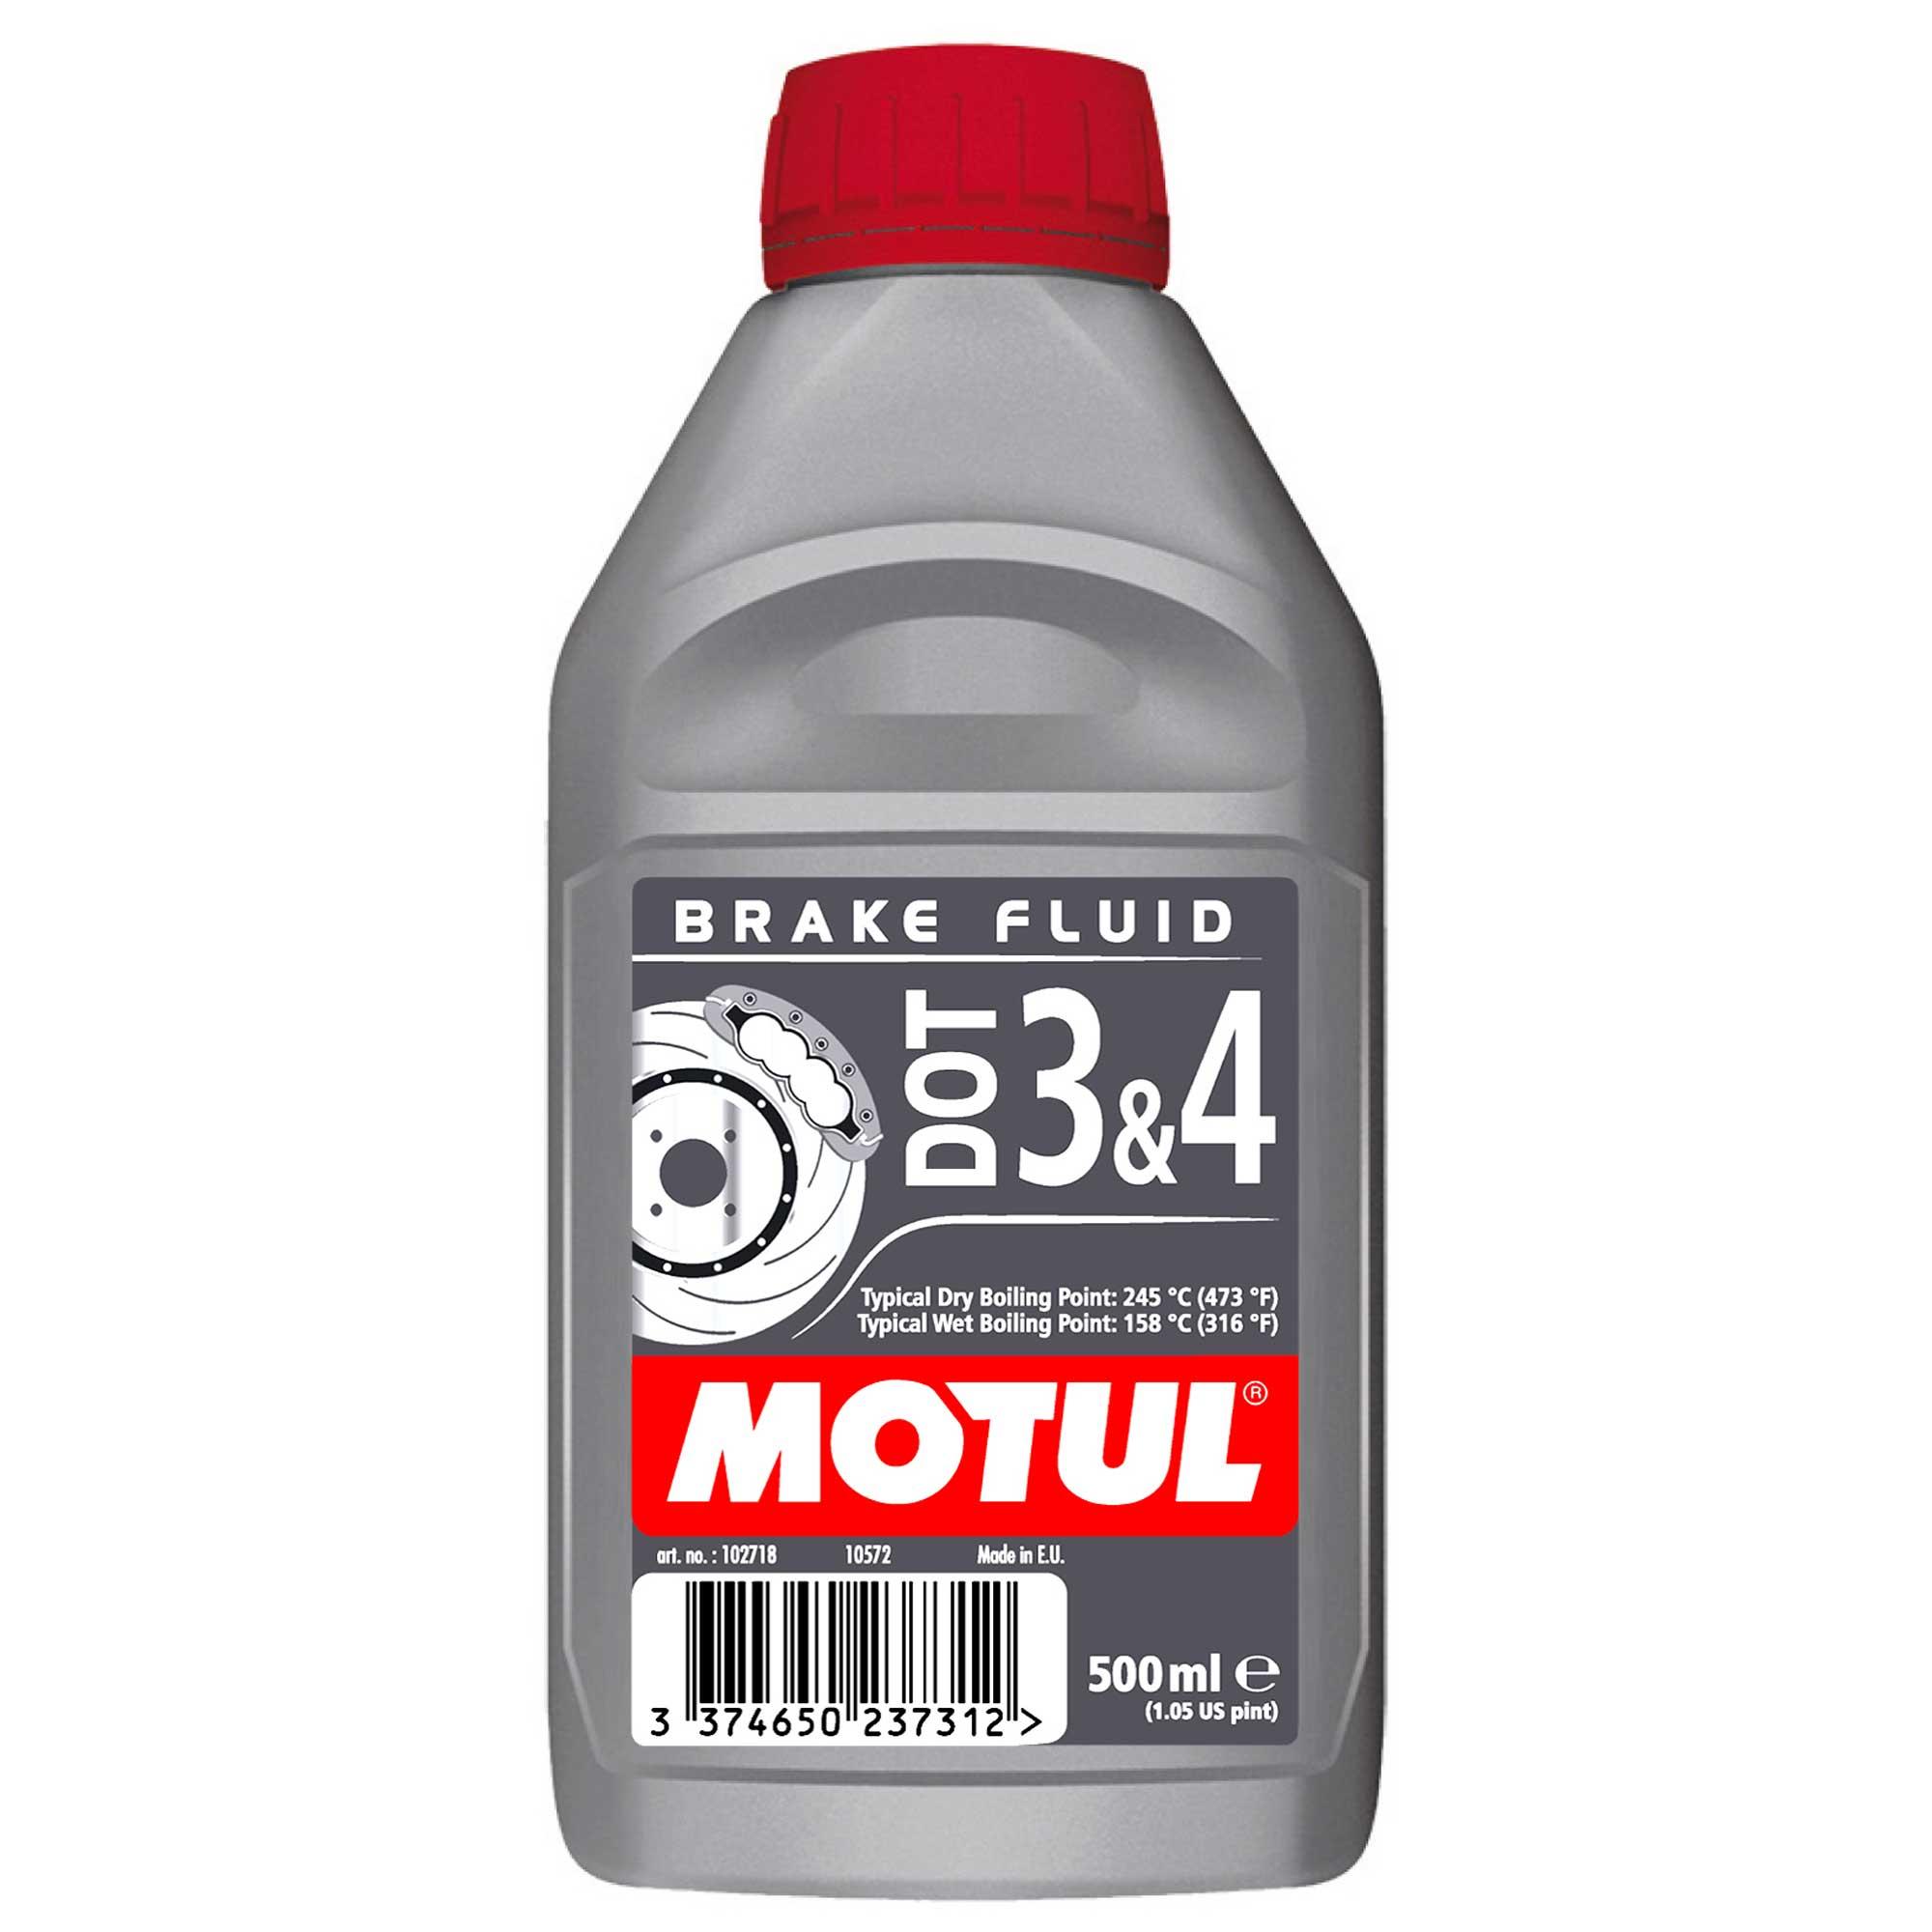 Motul Dot 34 Brake Fluid